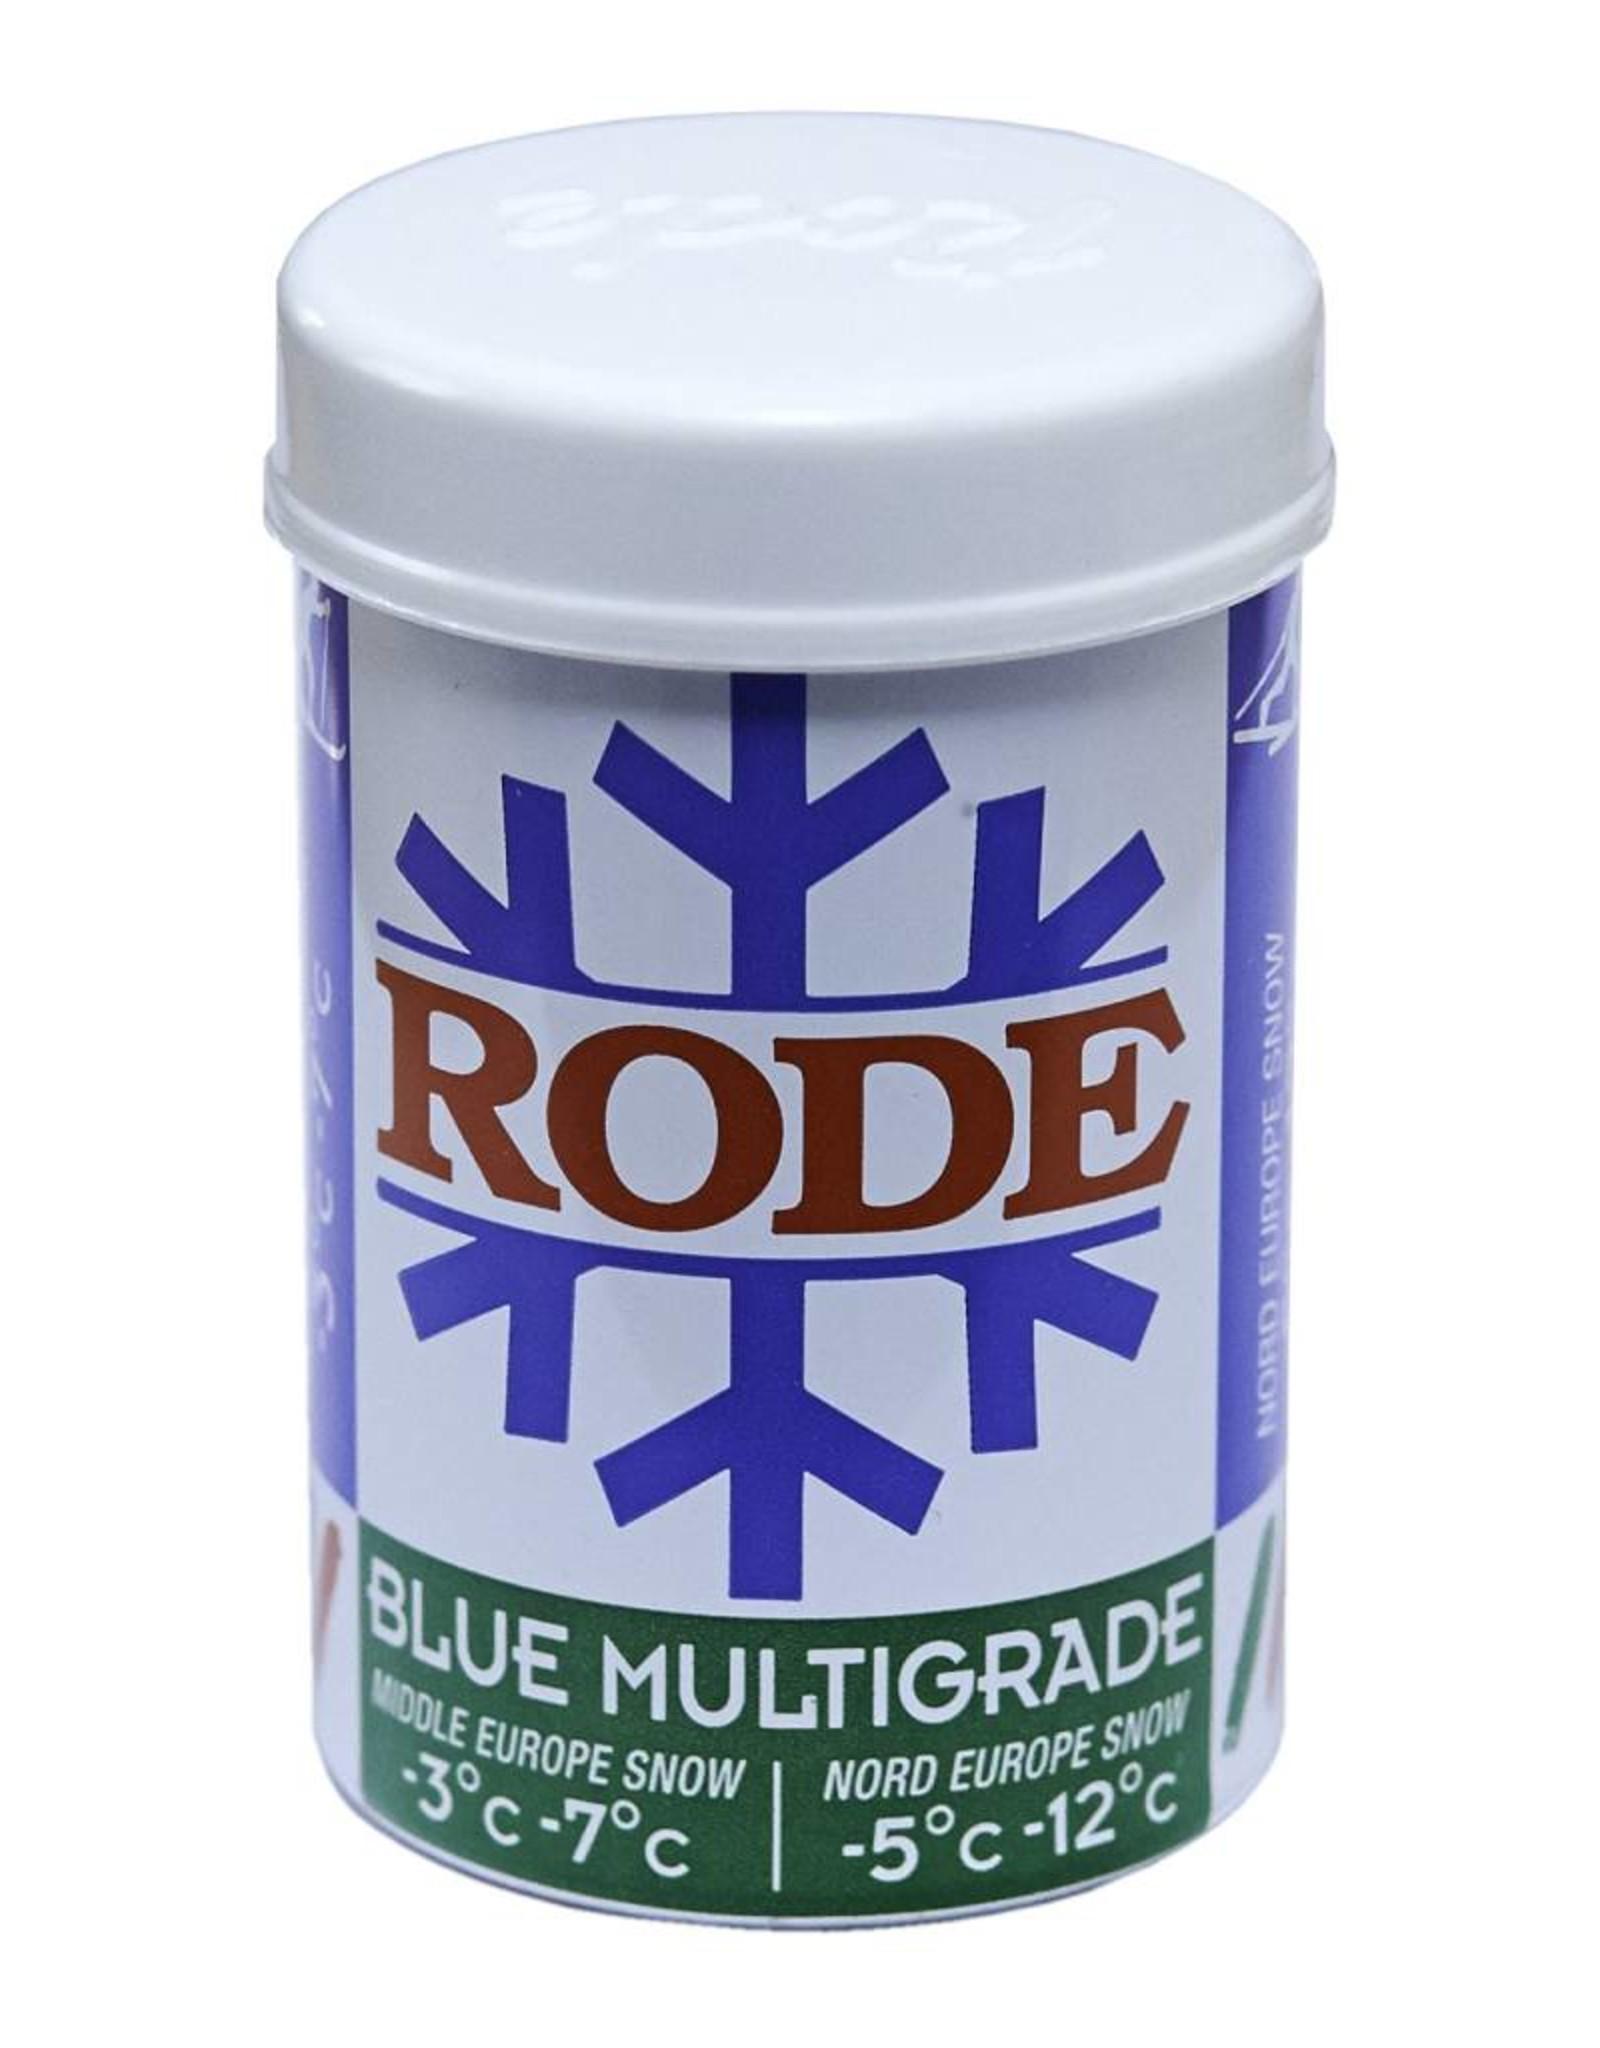 Rode Rode Blue Multigrade Kick Wax